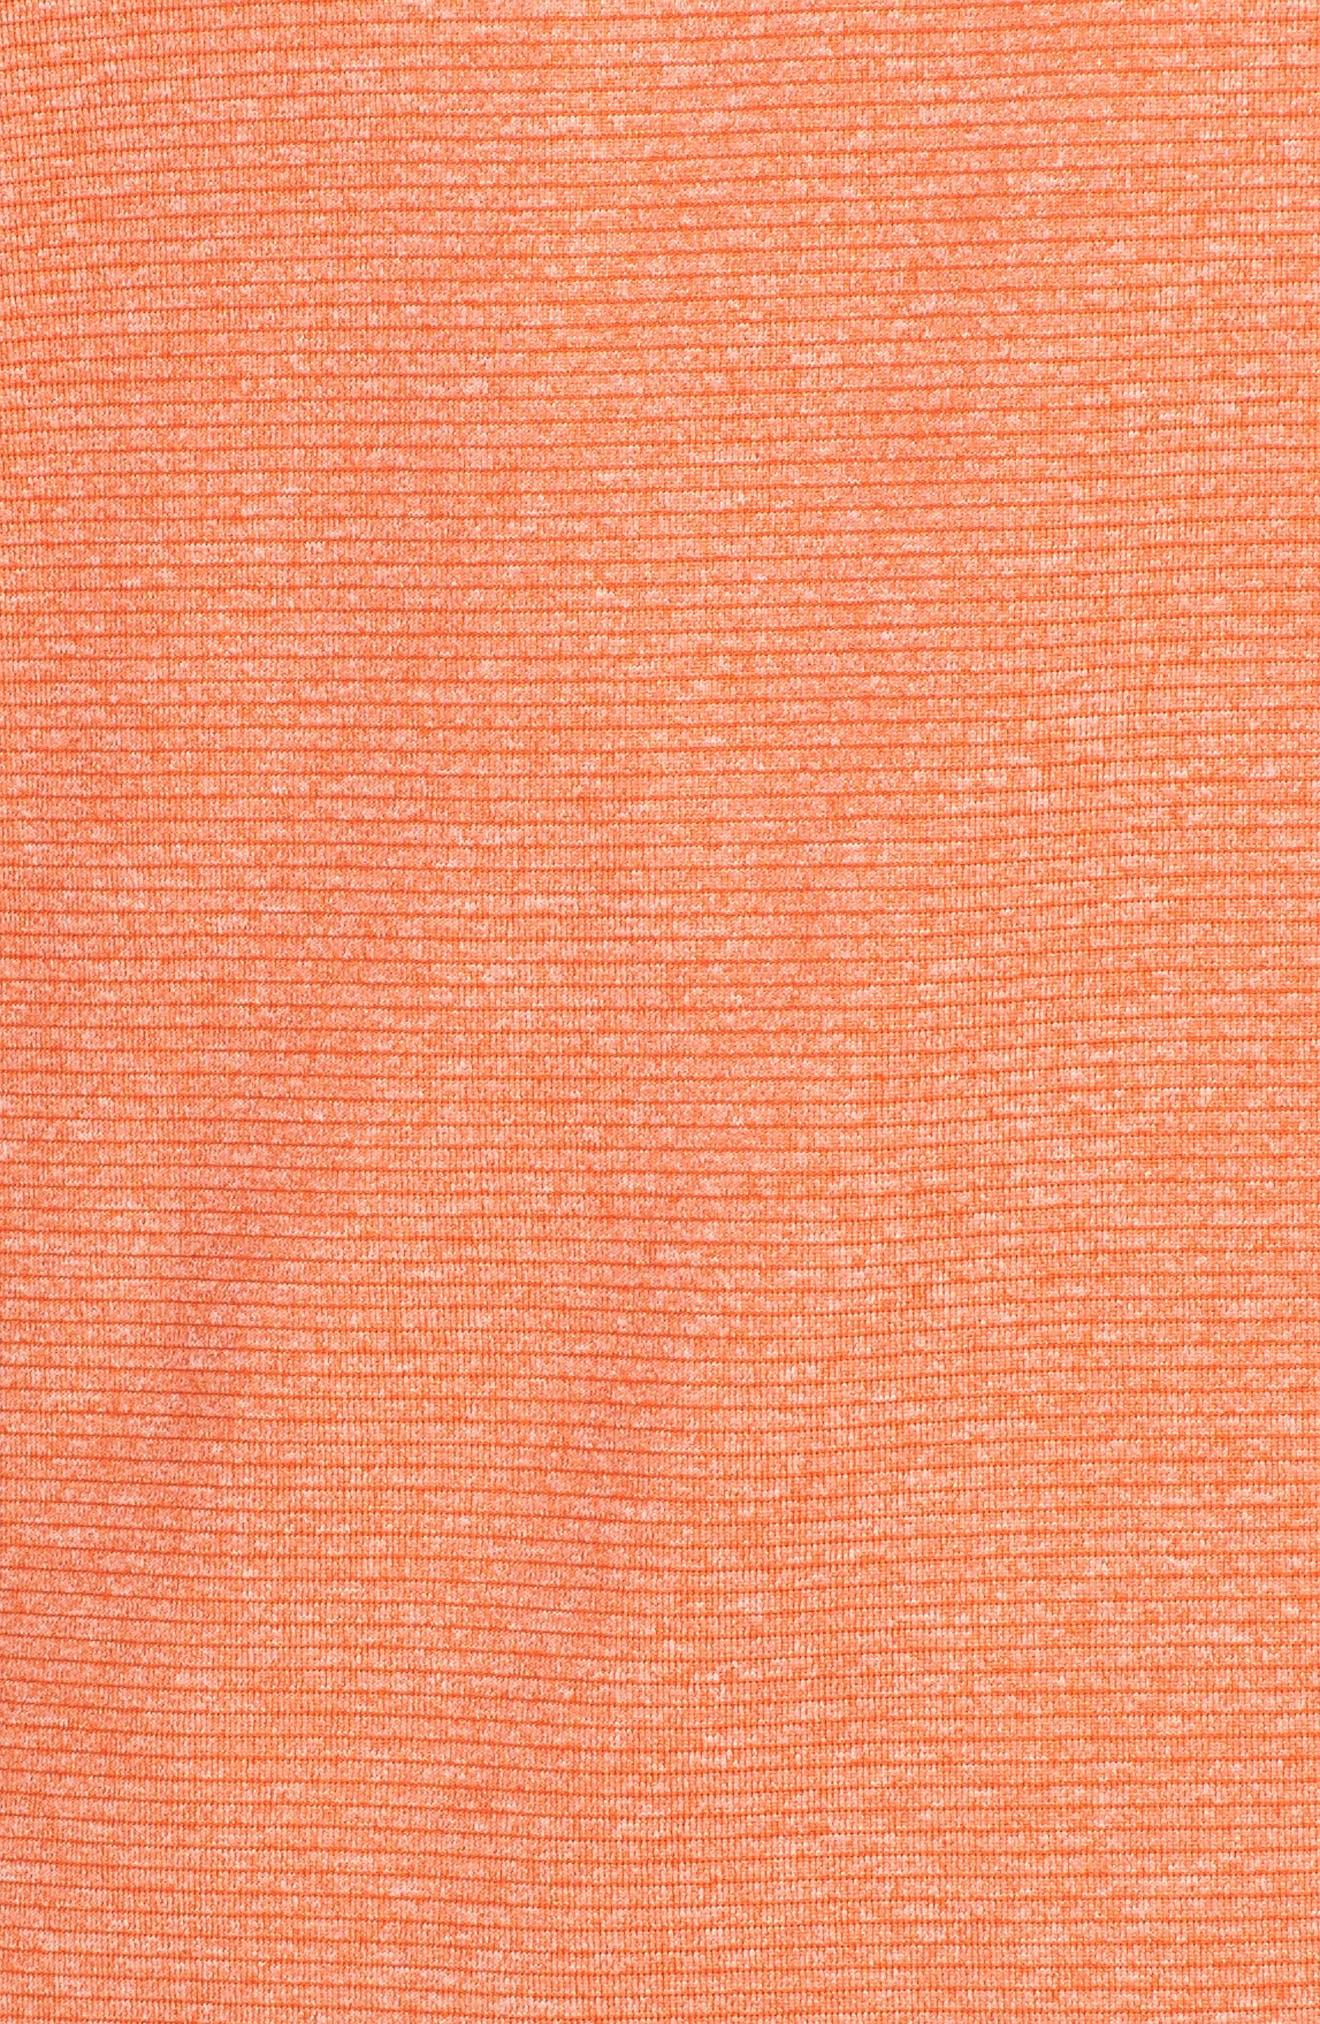 Shoreline - Cincinnati Bengals Half Zip Pullover,                             Alternate thumbnail 5, color,                             816